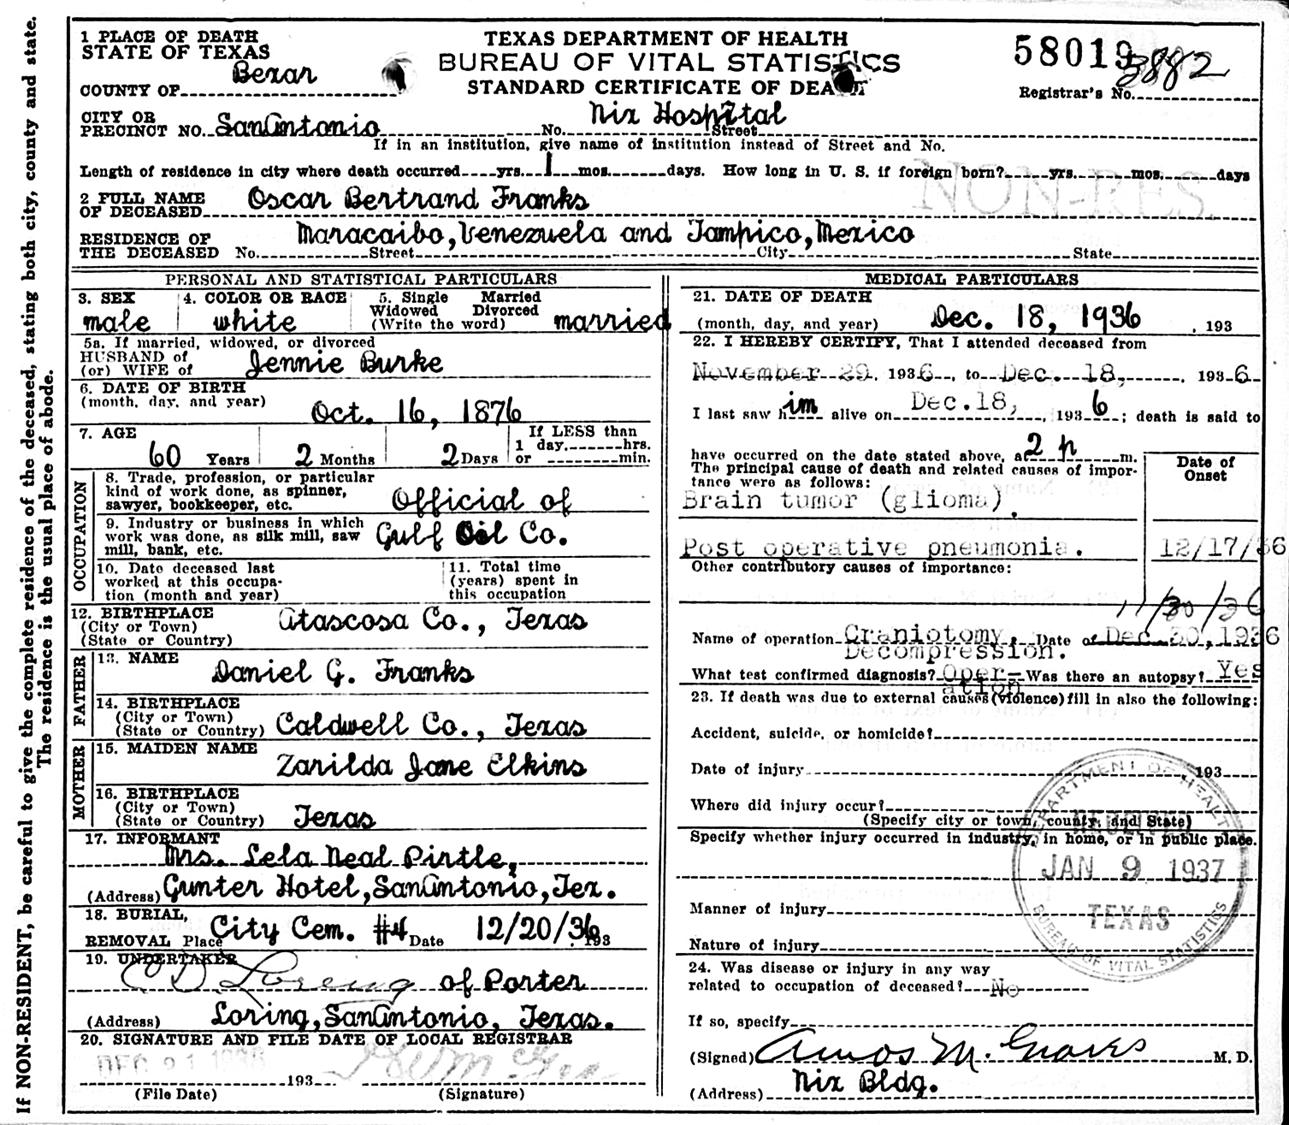 Daniel gandy franks oscar bertrand franks born october 16 1876 in pleasanton atascosa co tx died december 18 1936 at nix hospital san antonio bexar co tx age 60 aiddatafo Images